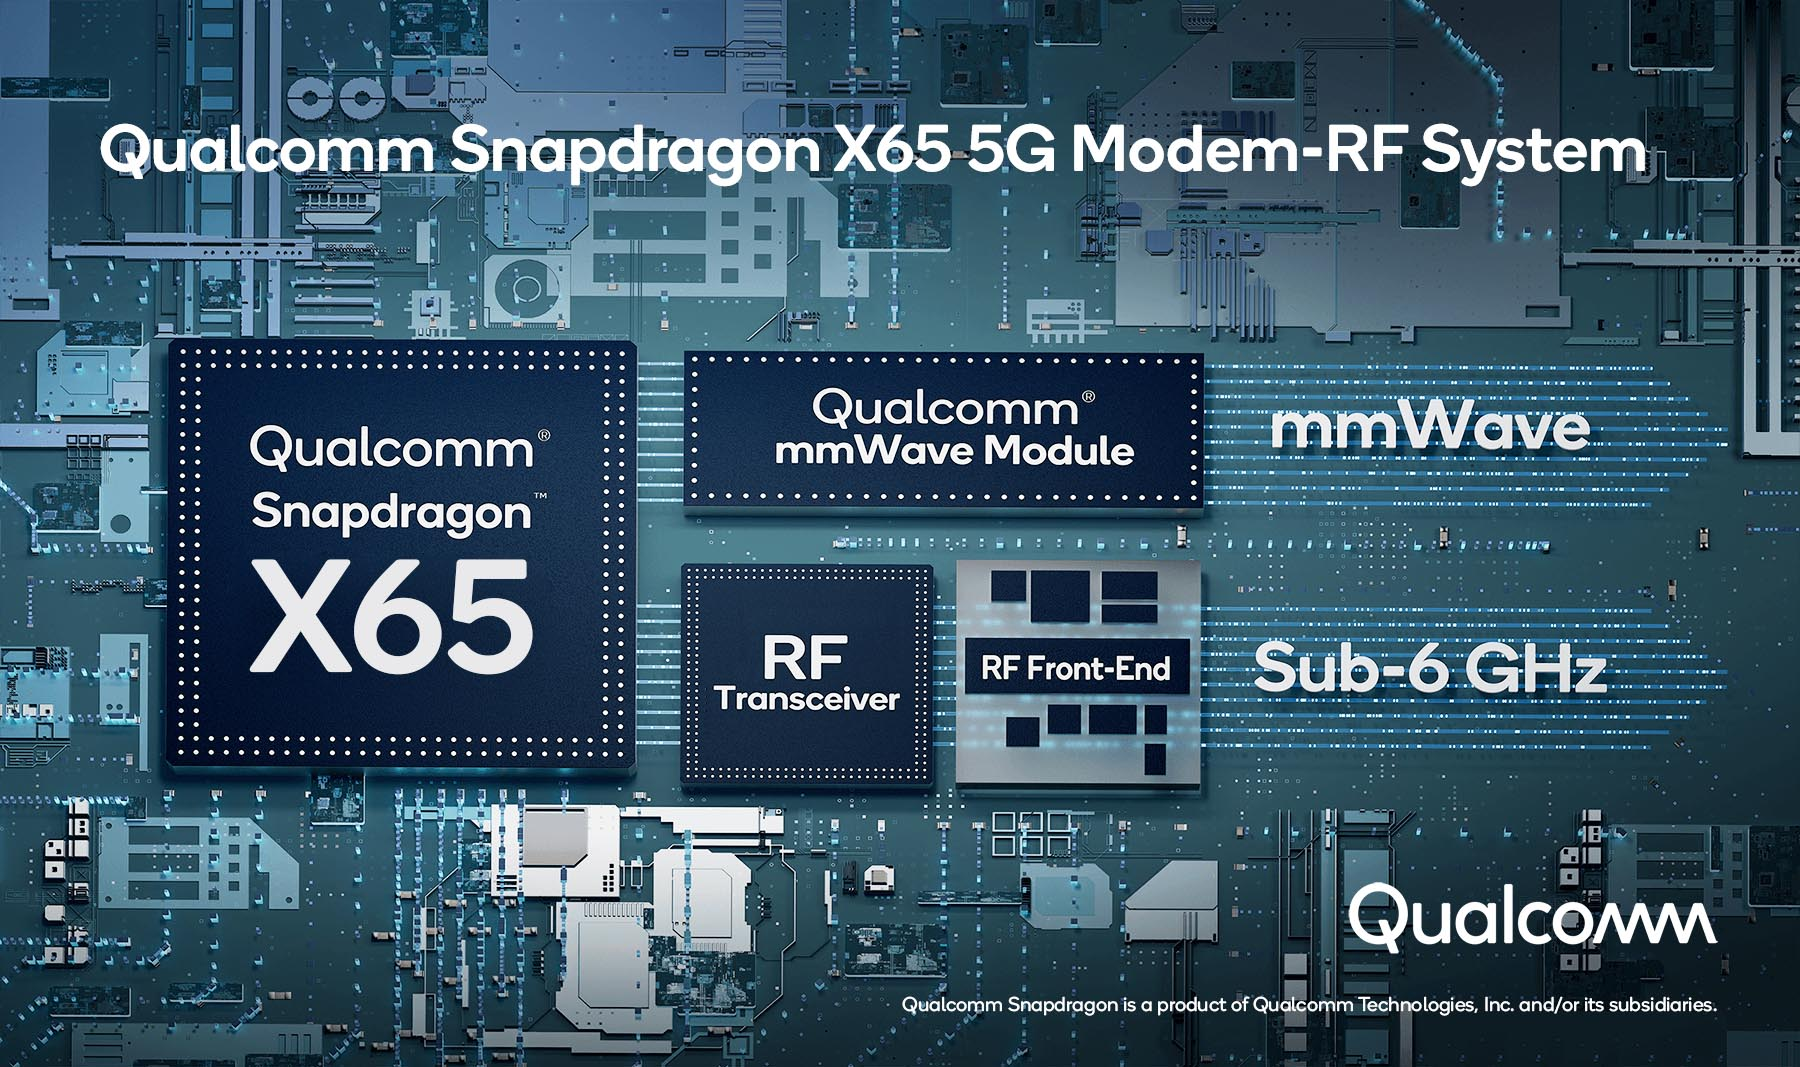 Qualcomm modem 5G Snapdragon X65